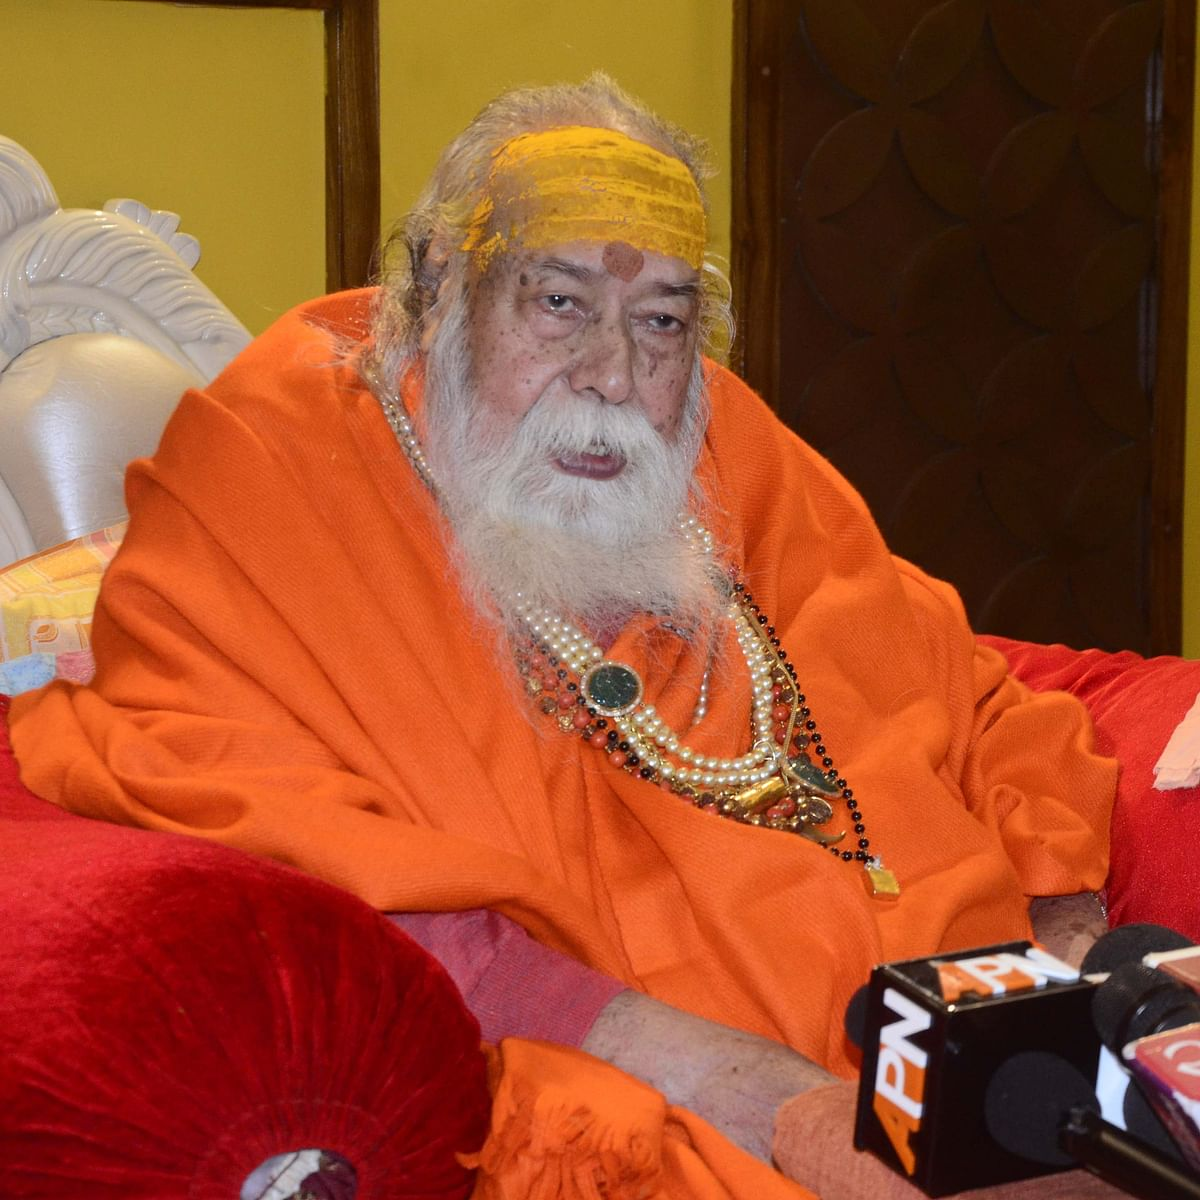 Bhopal: No need for CAA, says Shankaracharya Swaroopanand Saraswati